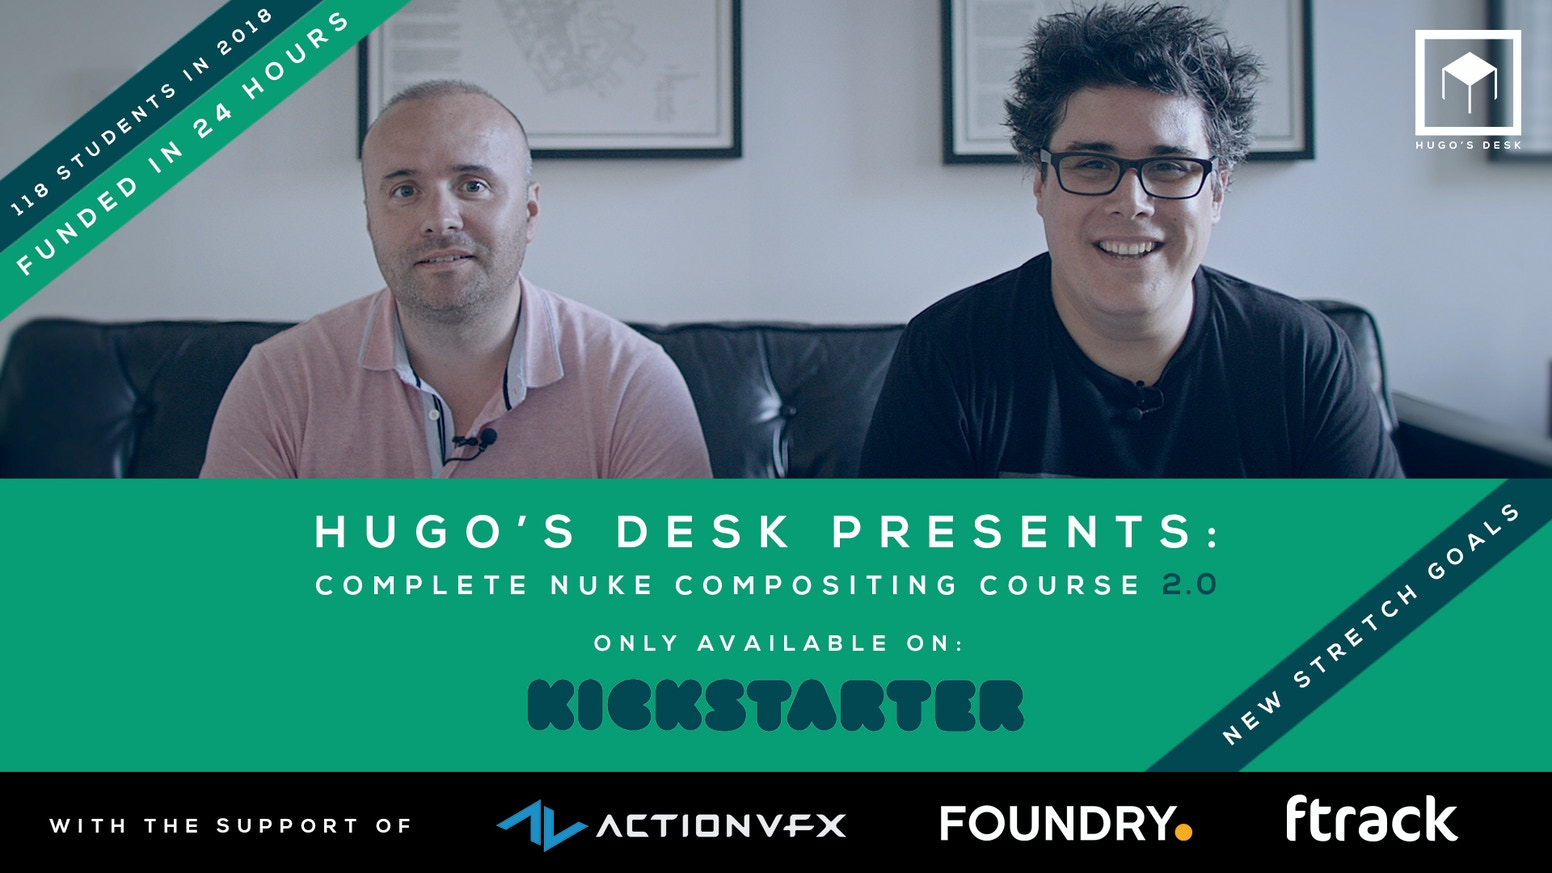 Hugo's Desk Presents: Complete Nuke Compositing course 2 0 by Hugo's